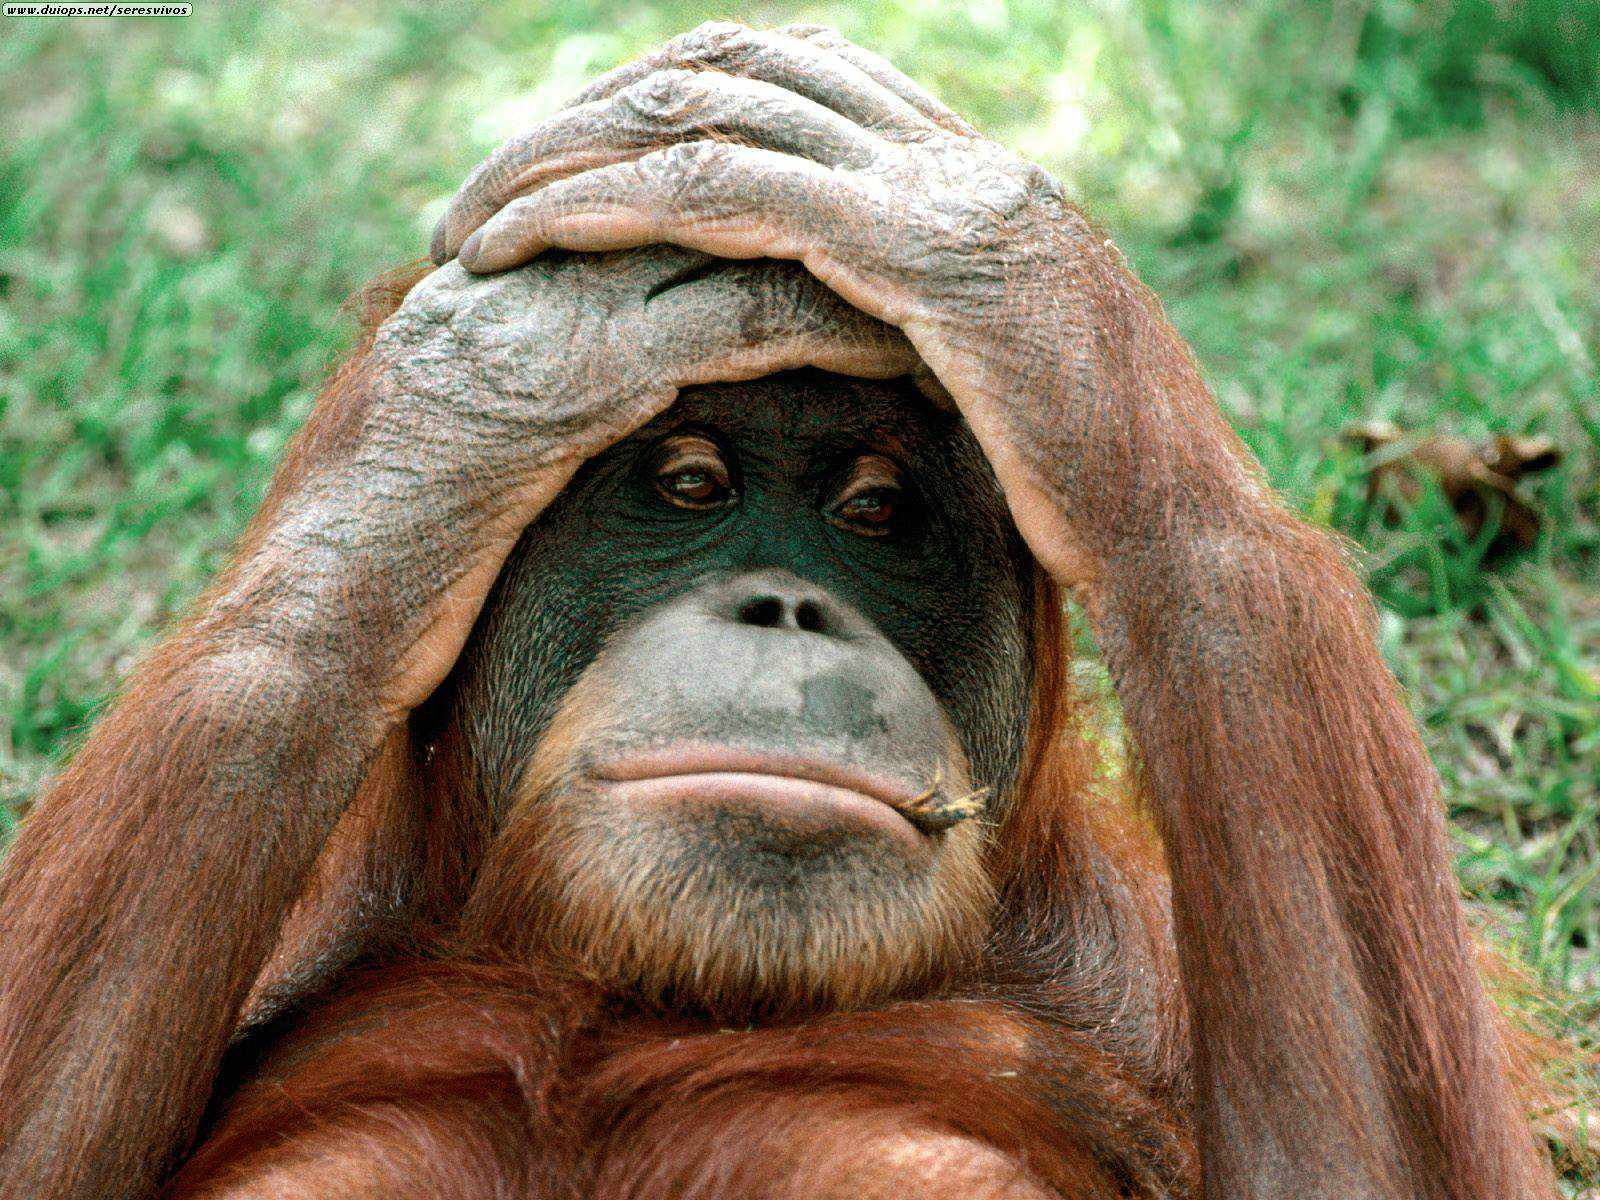 Monkeys - Orangutans hands on head | END Trophy Hunting NOW